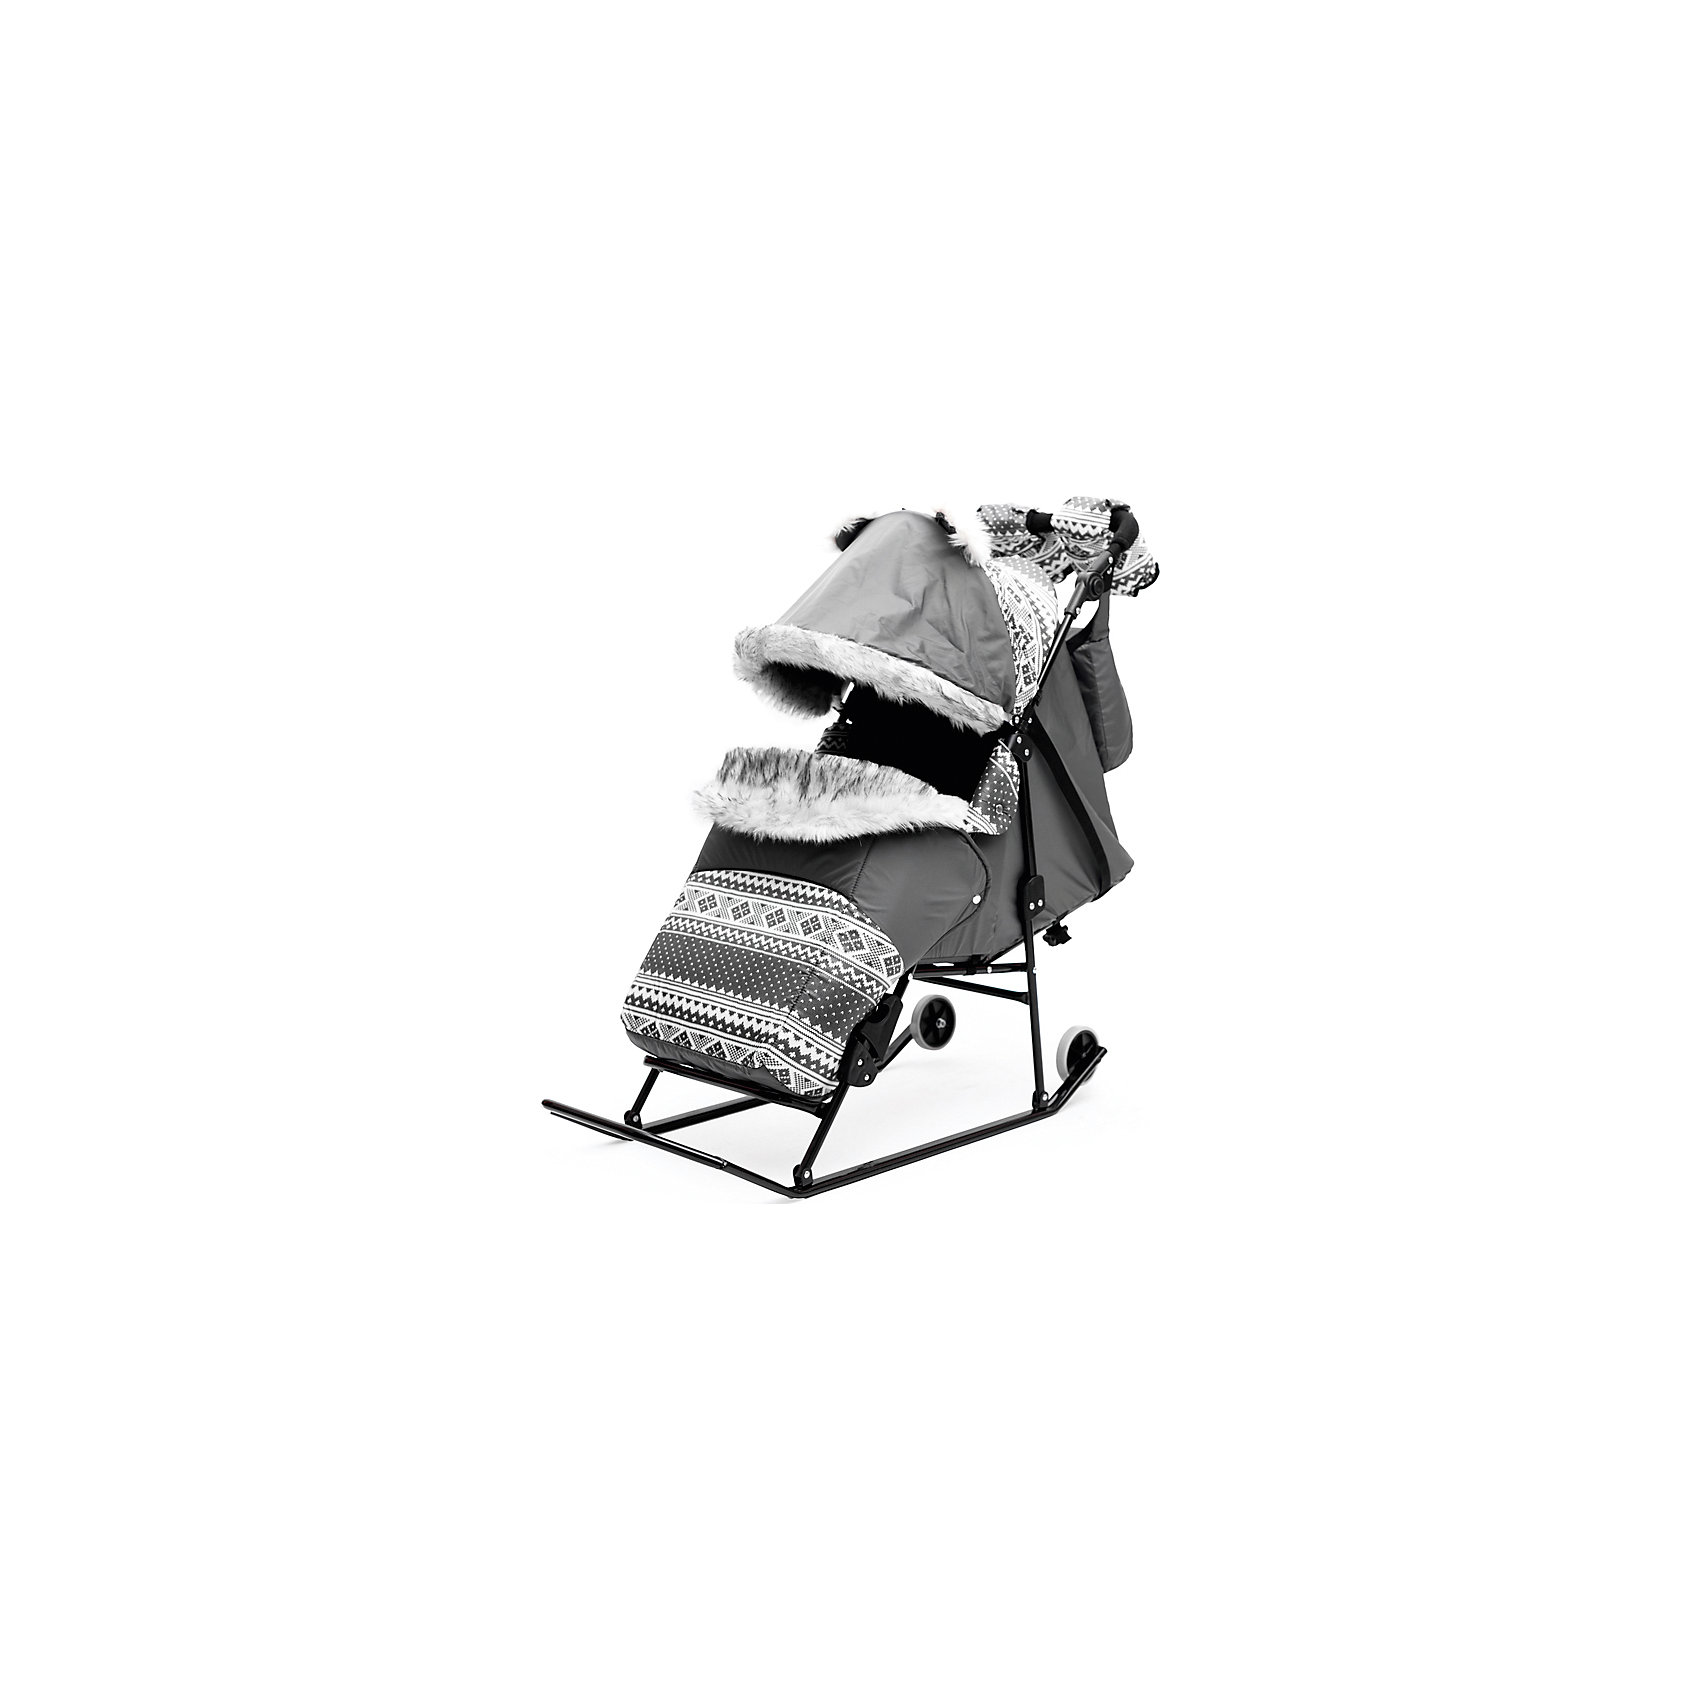 Скандинавия Санки-коляска Скандинавия 2УВ Авто, черная рама, ABC Academy, серый